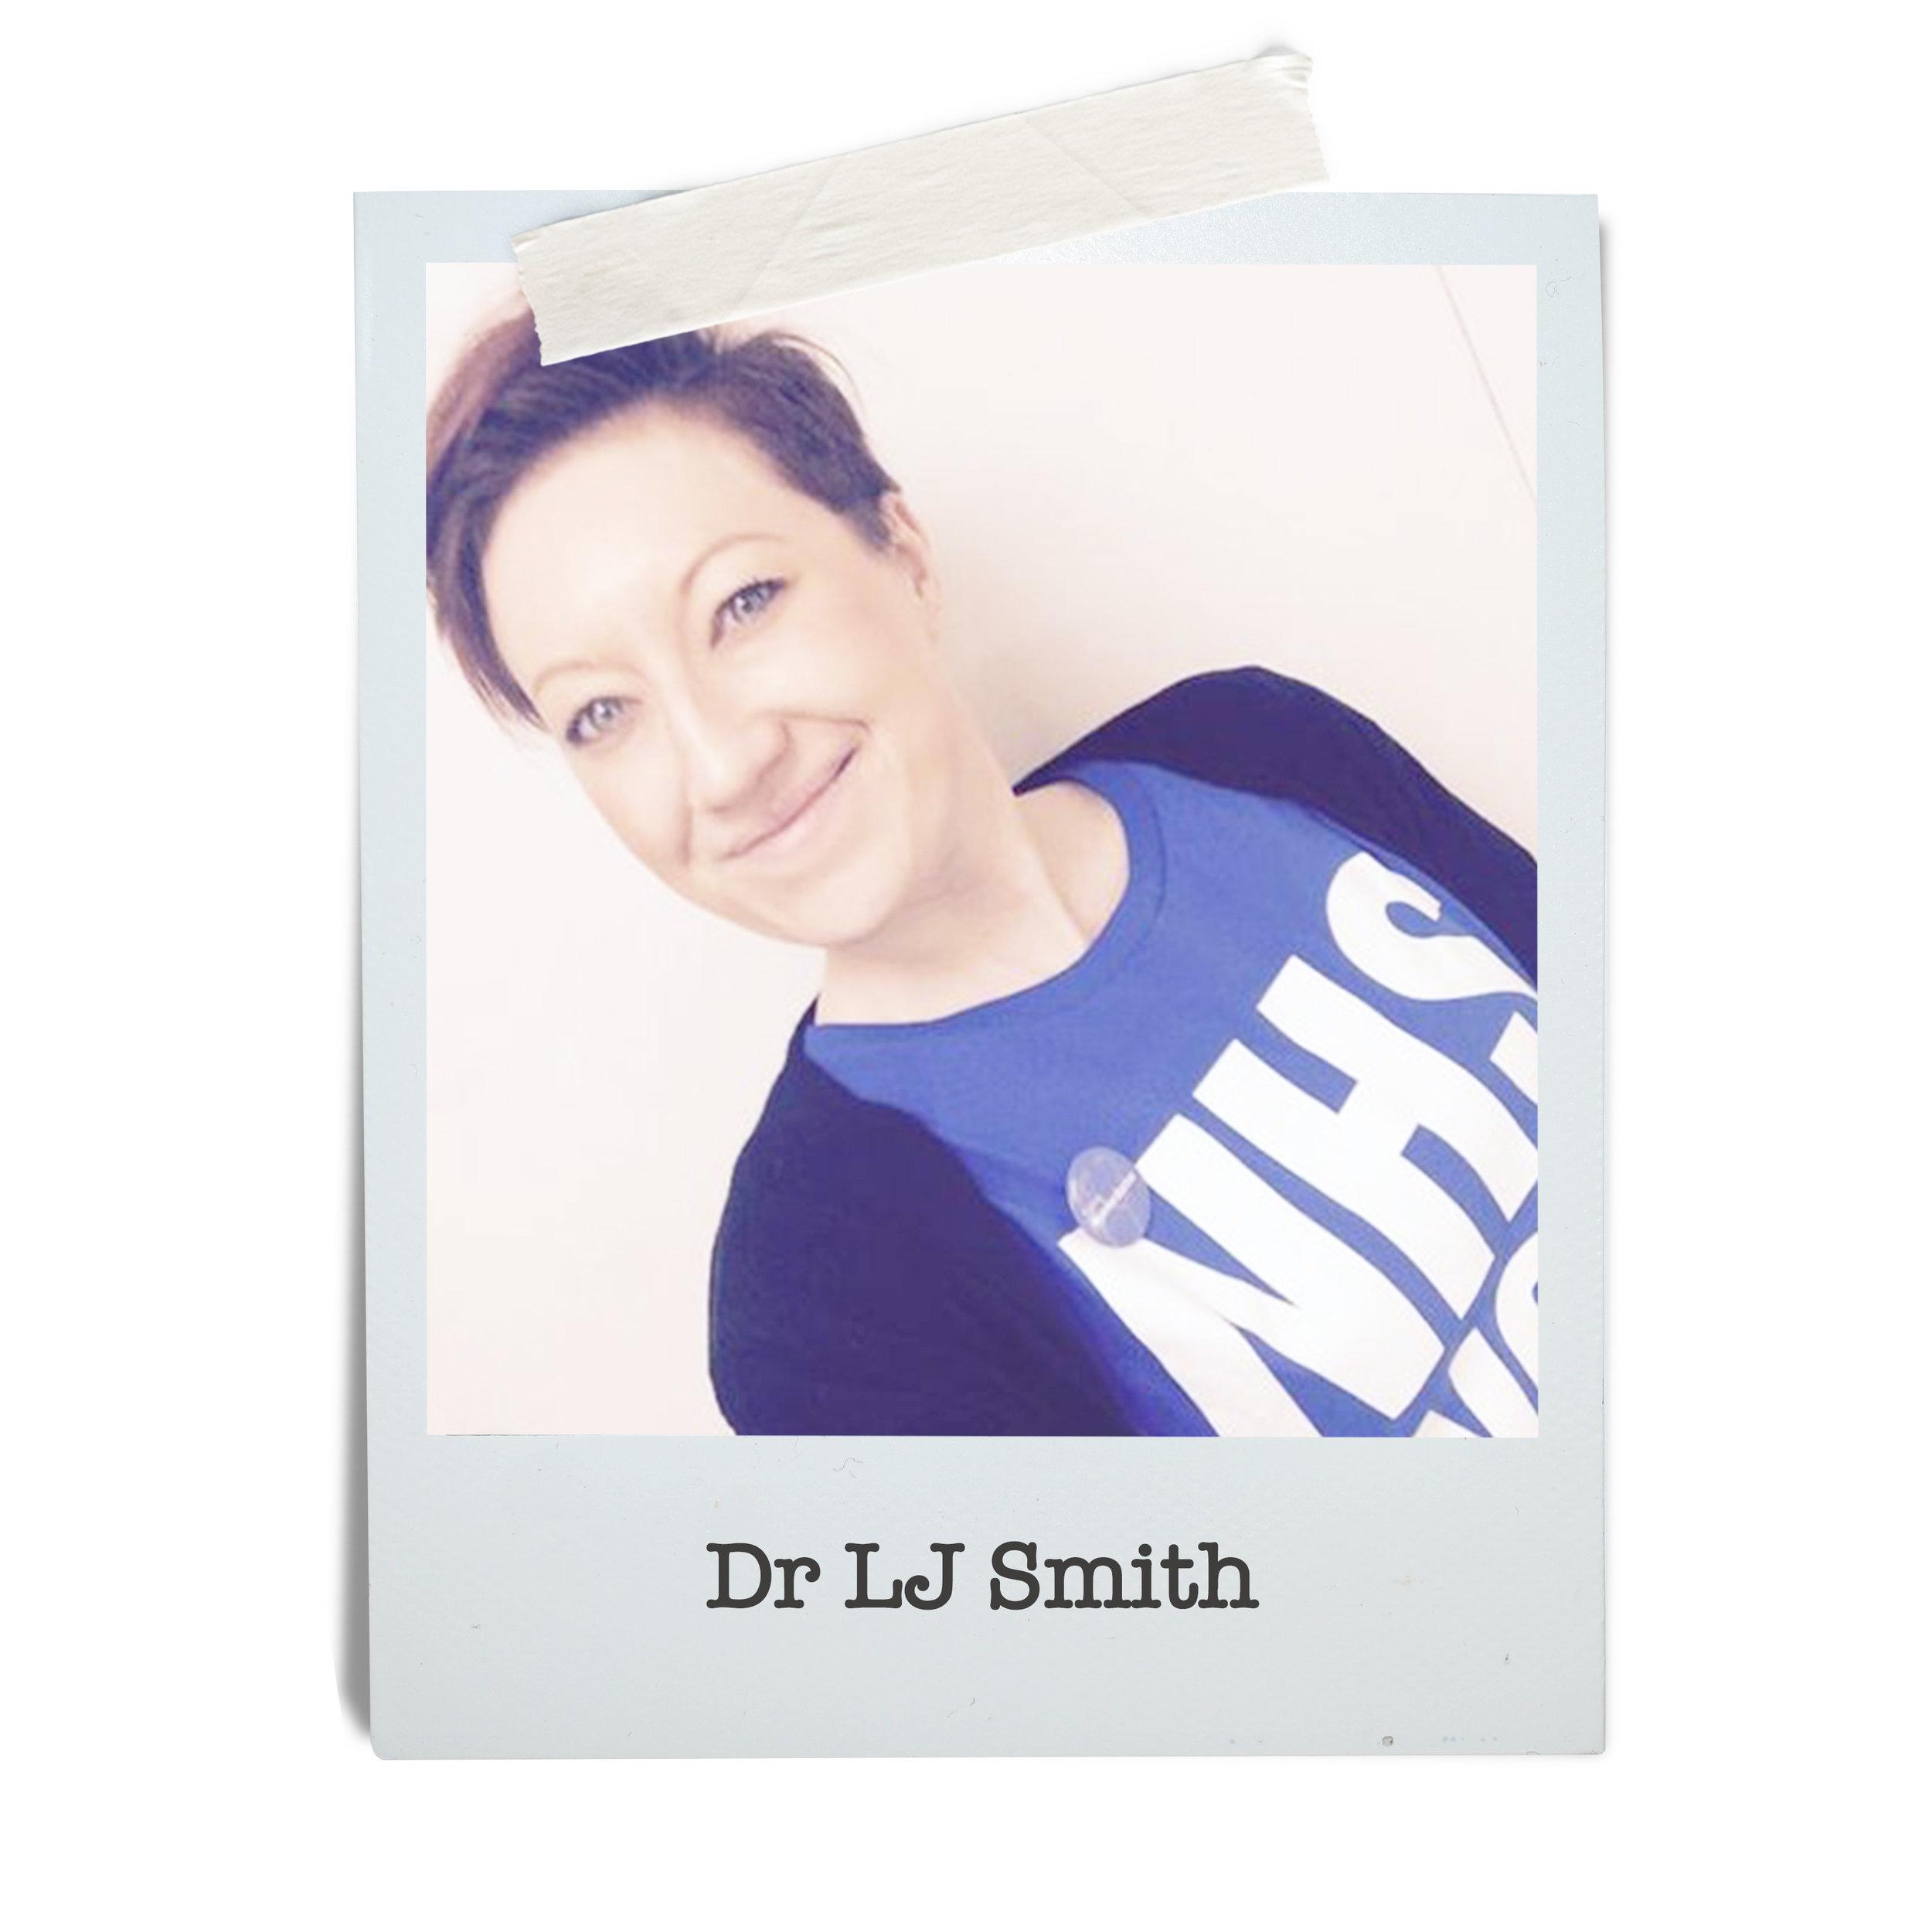 Dr LJ Smith